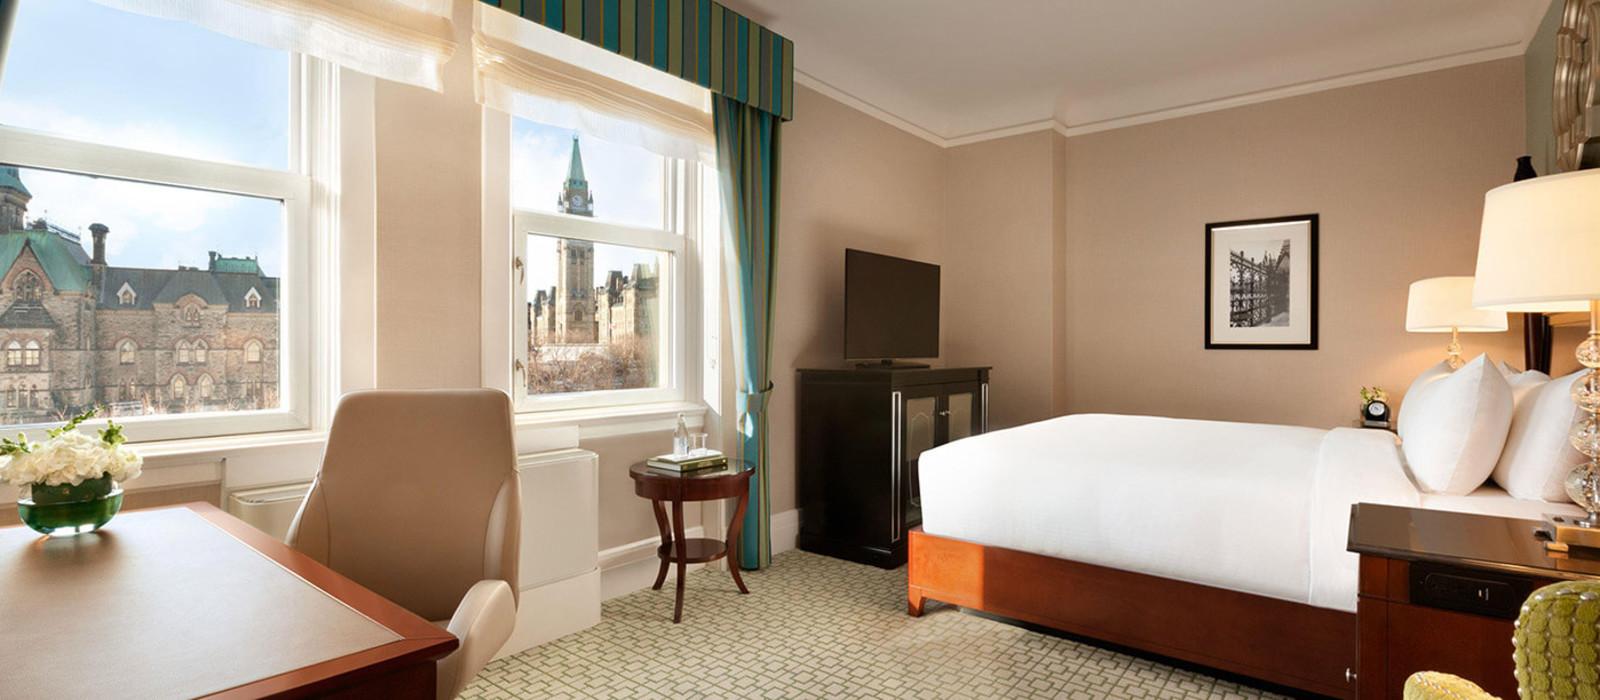 Hotel Fairmont Chateau Laurier Canada